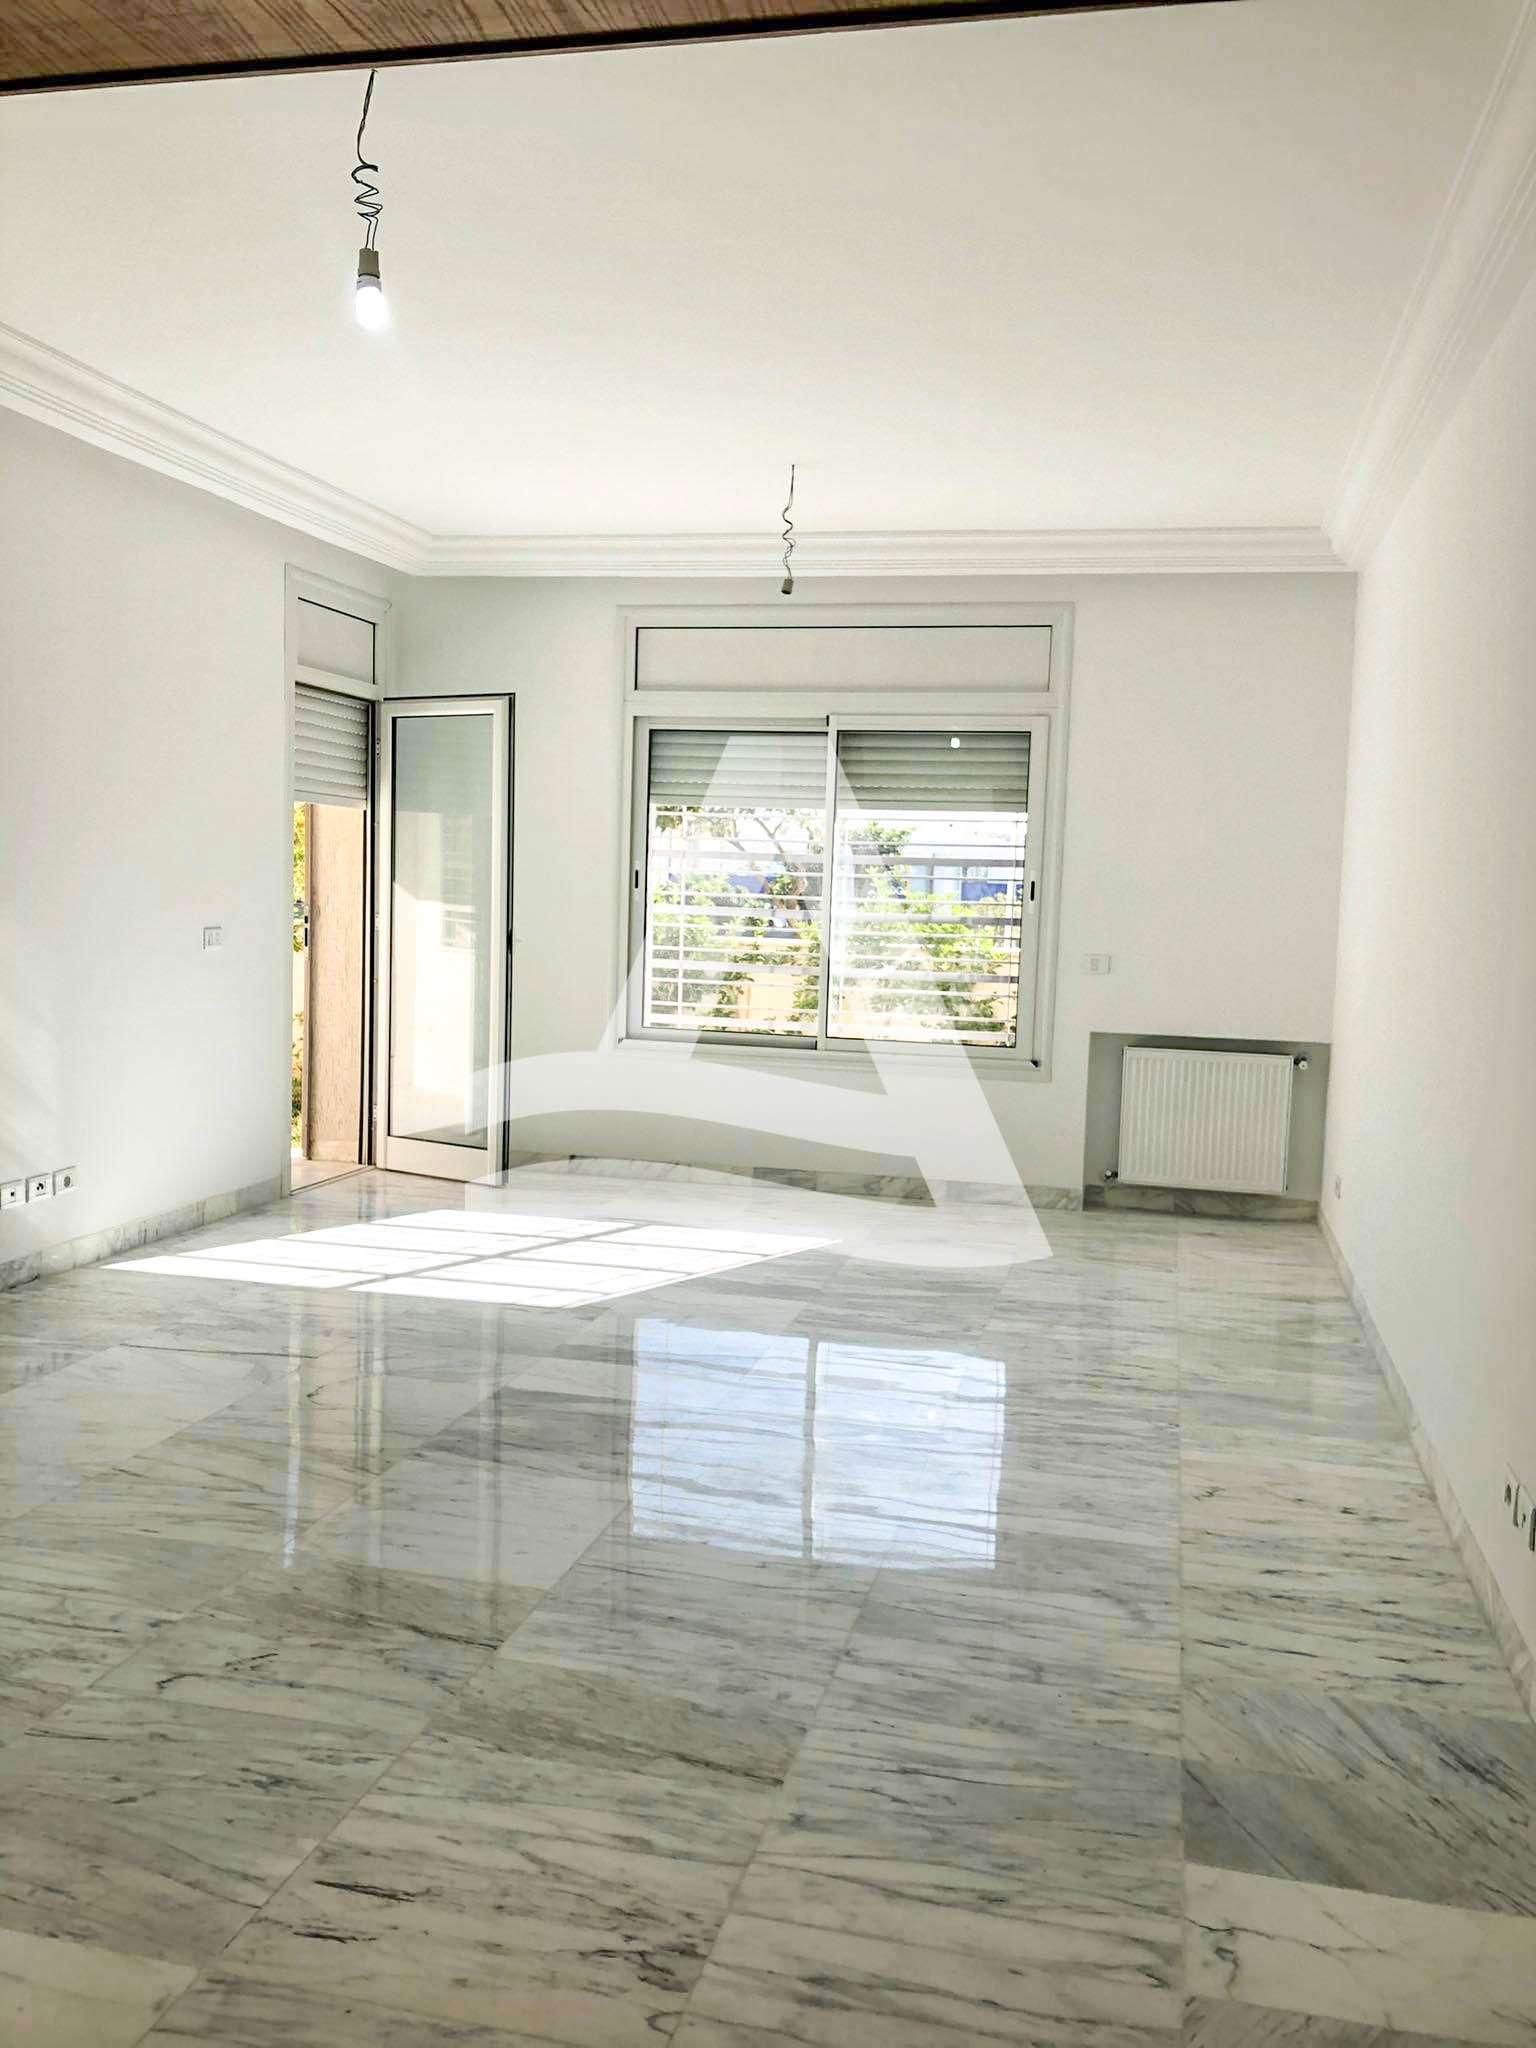 httpss3.amazonaws.comlogimoaws17751166431611135265appartement_jardin_de_carthage_10_sur_13-2